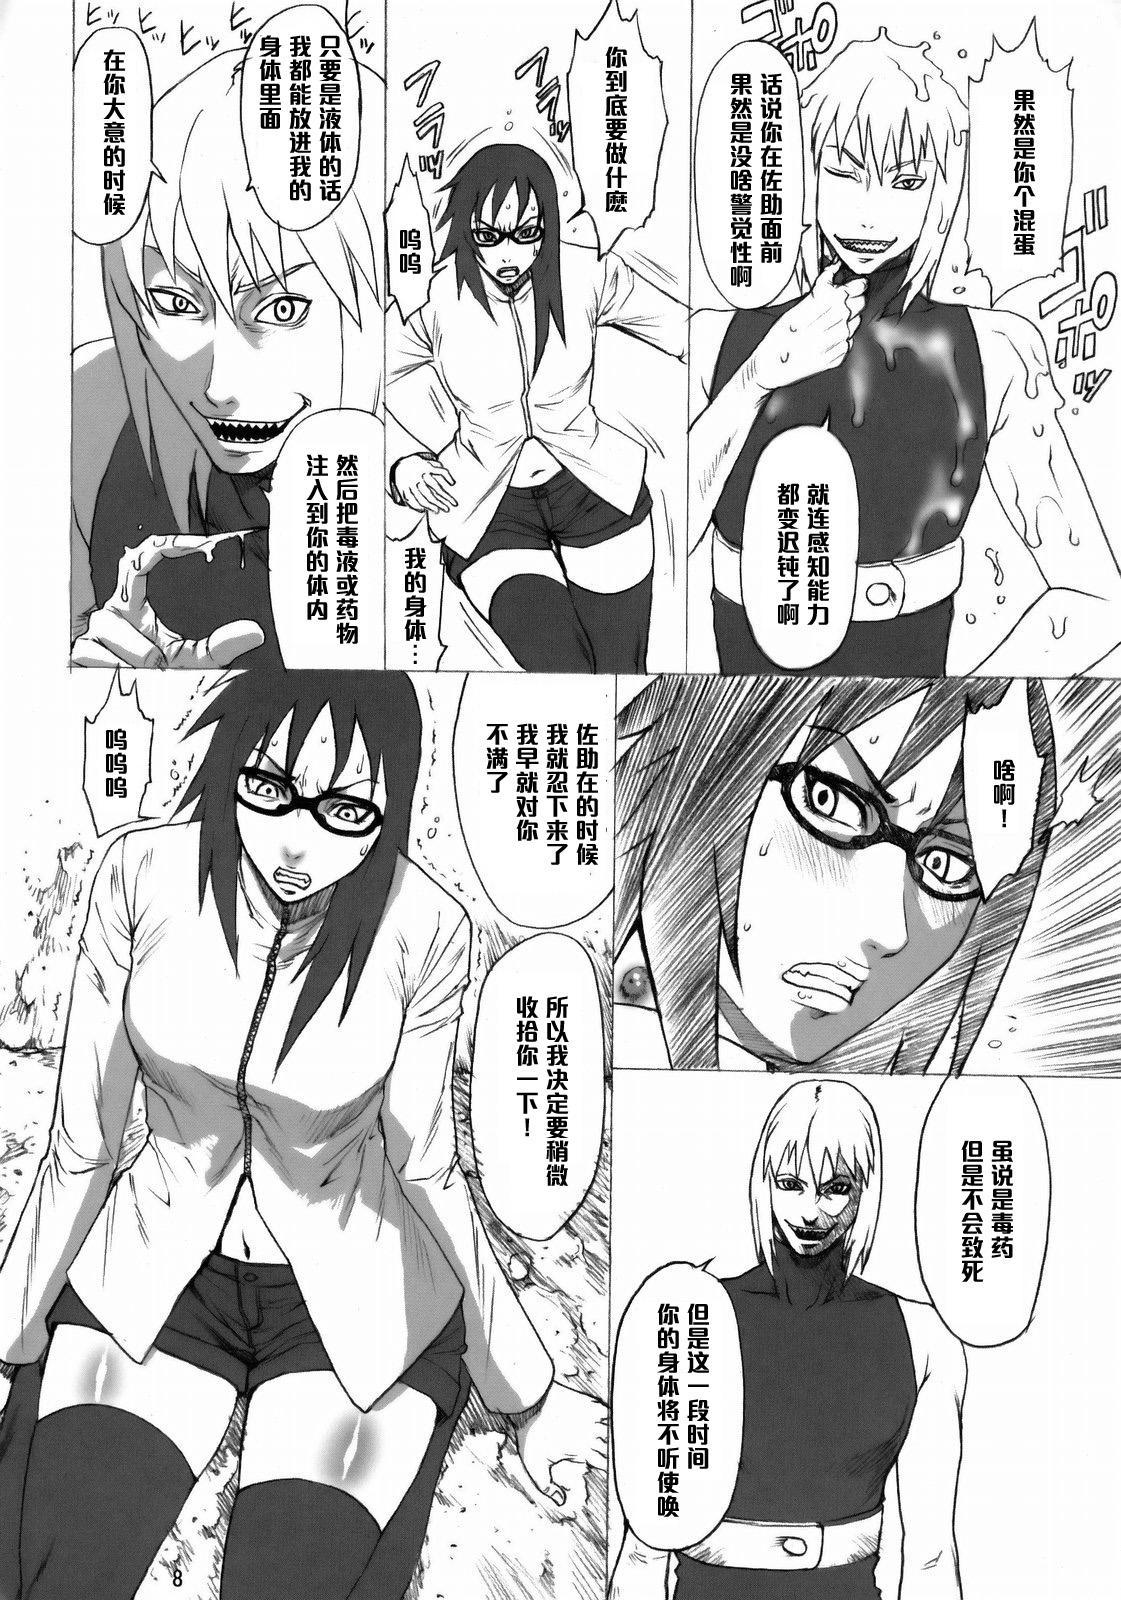 NINJA EXTREME 3 Onna Goroshi Shippuuden 6